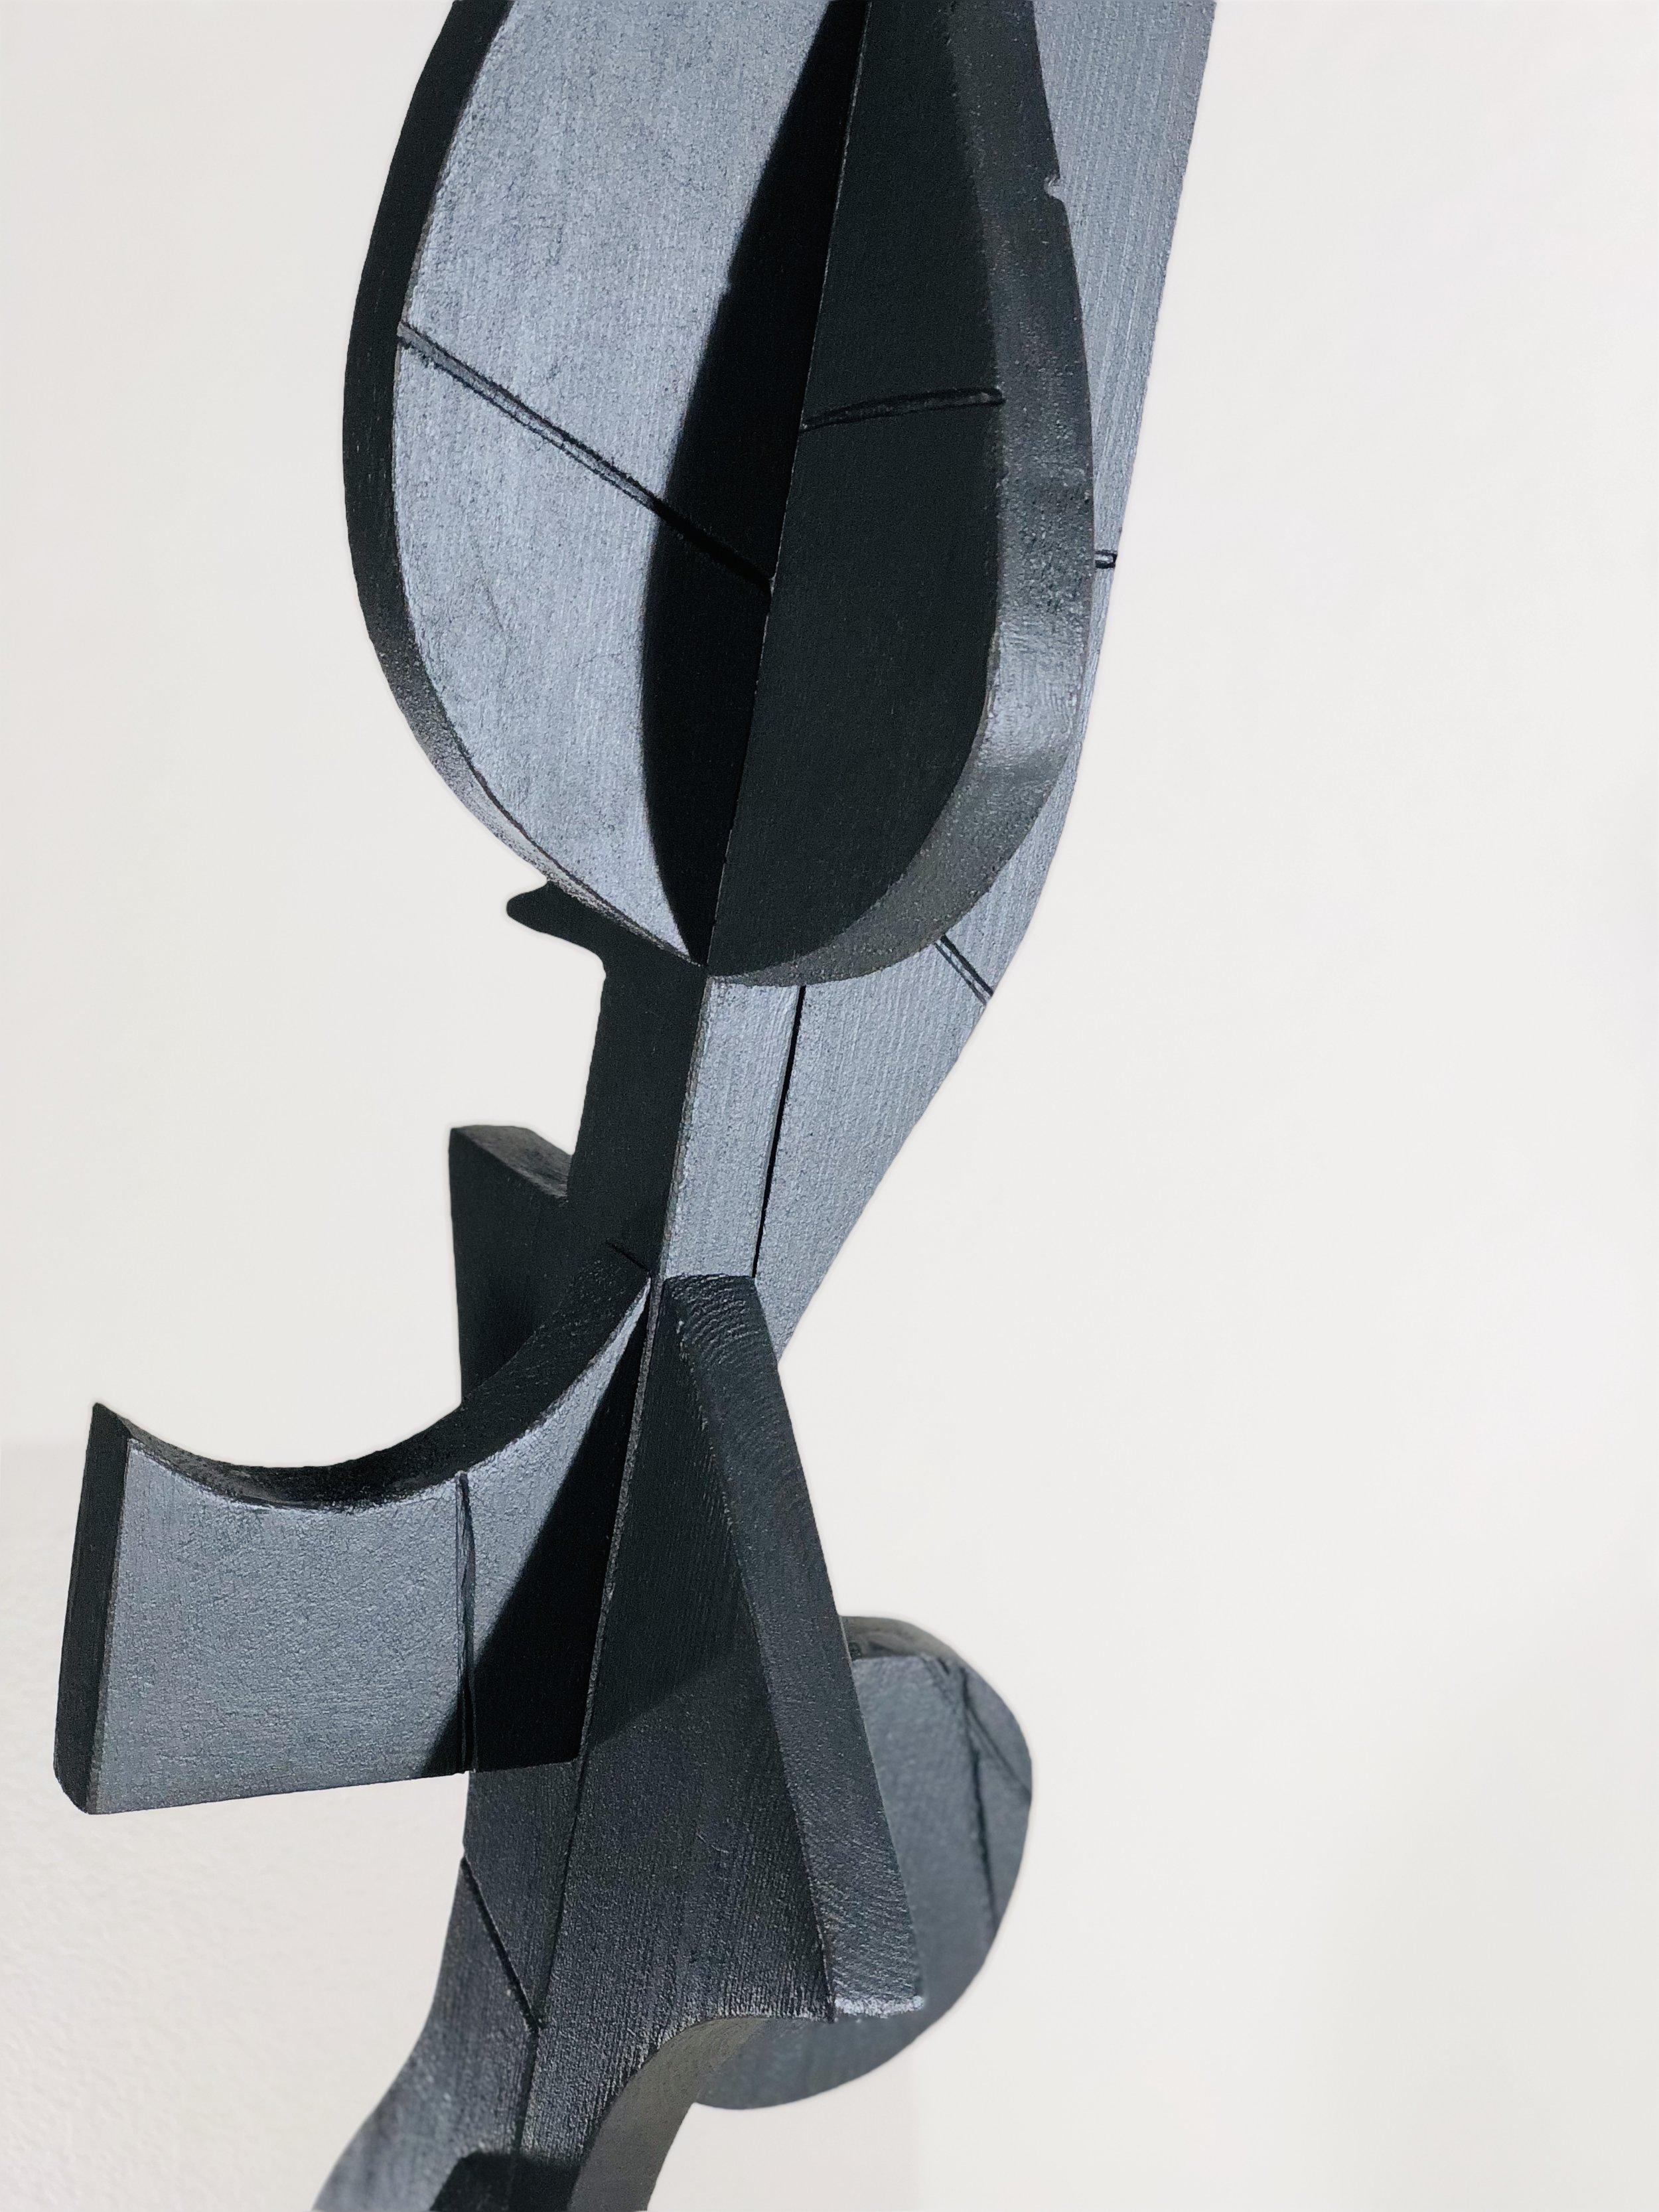 3/DEATION - The art of Josh Schoemaker in sculptural form